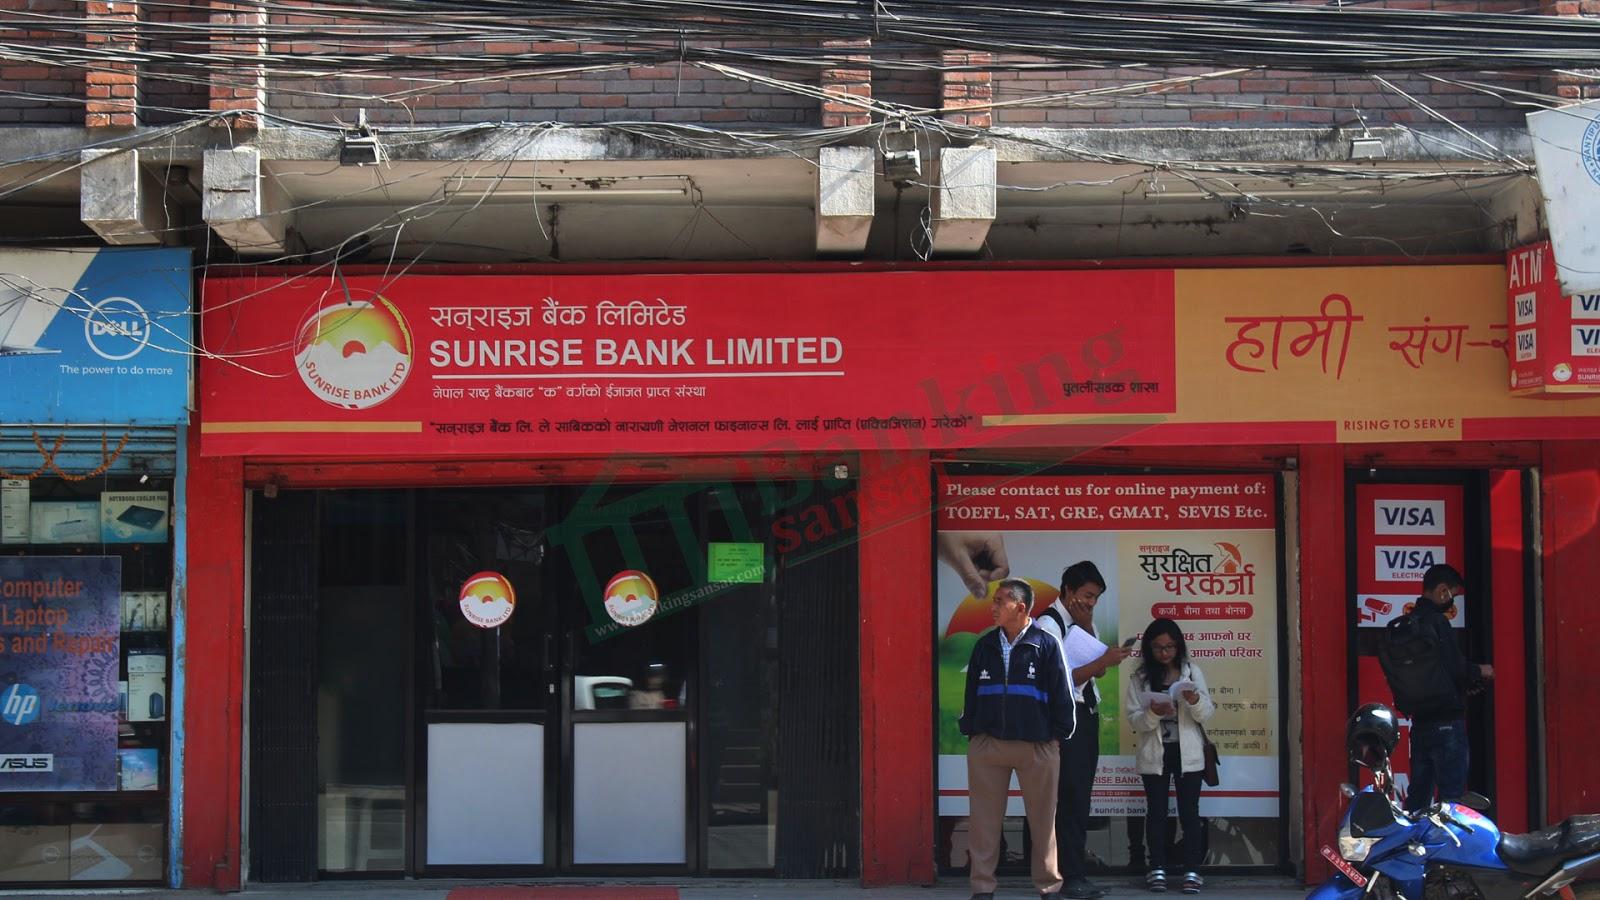 Sunrise Bank